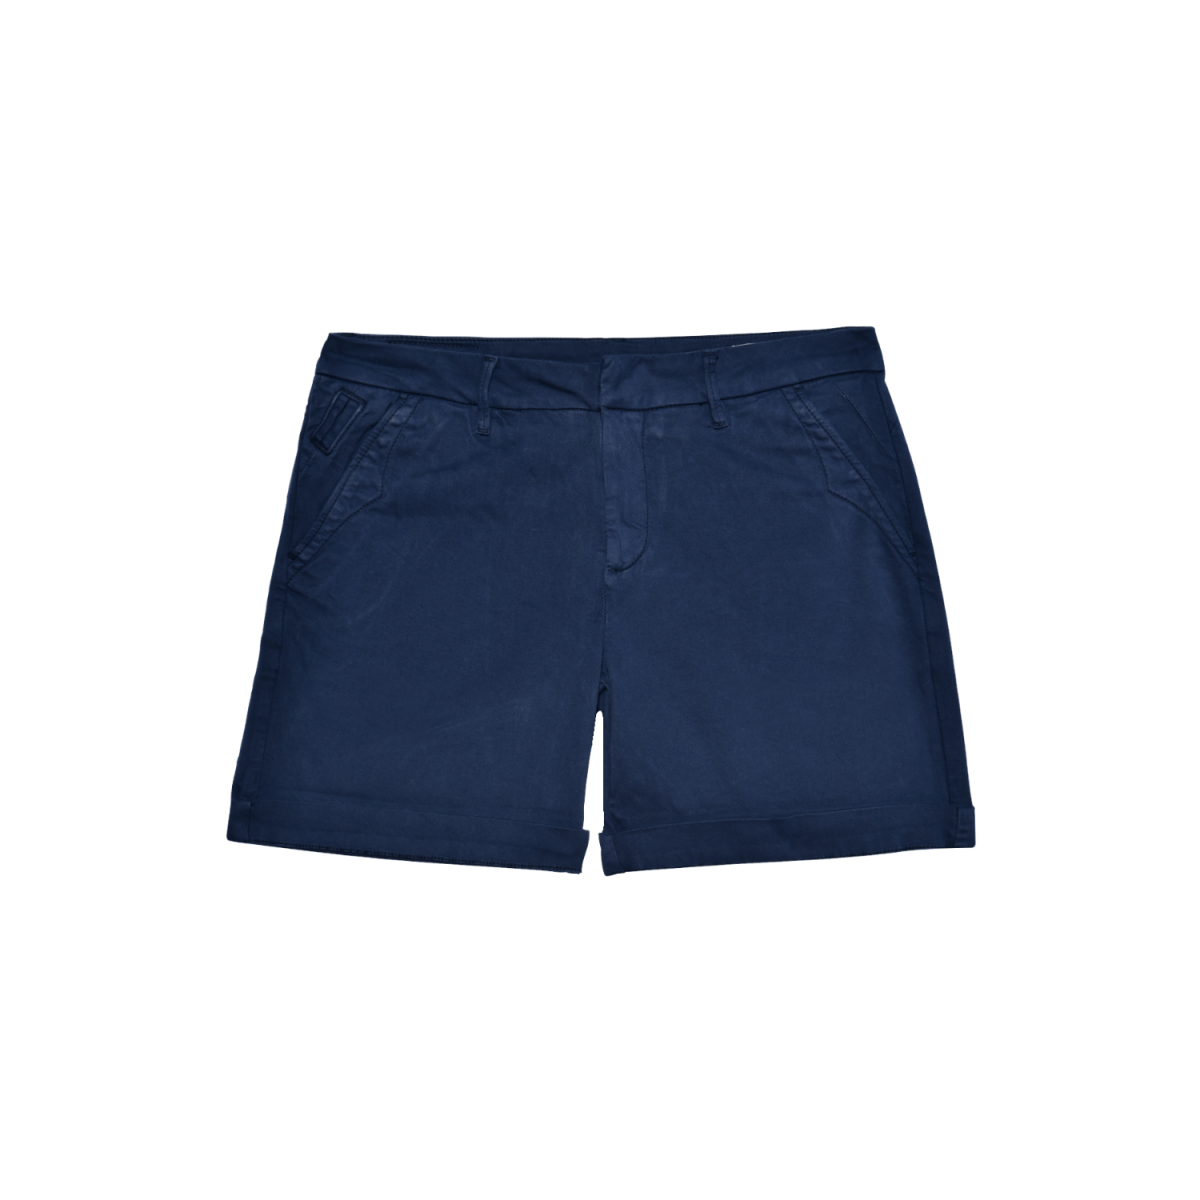 selena shorts - dark navy